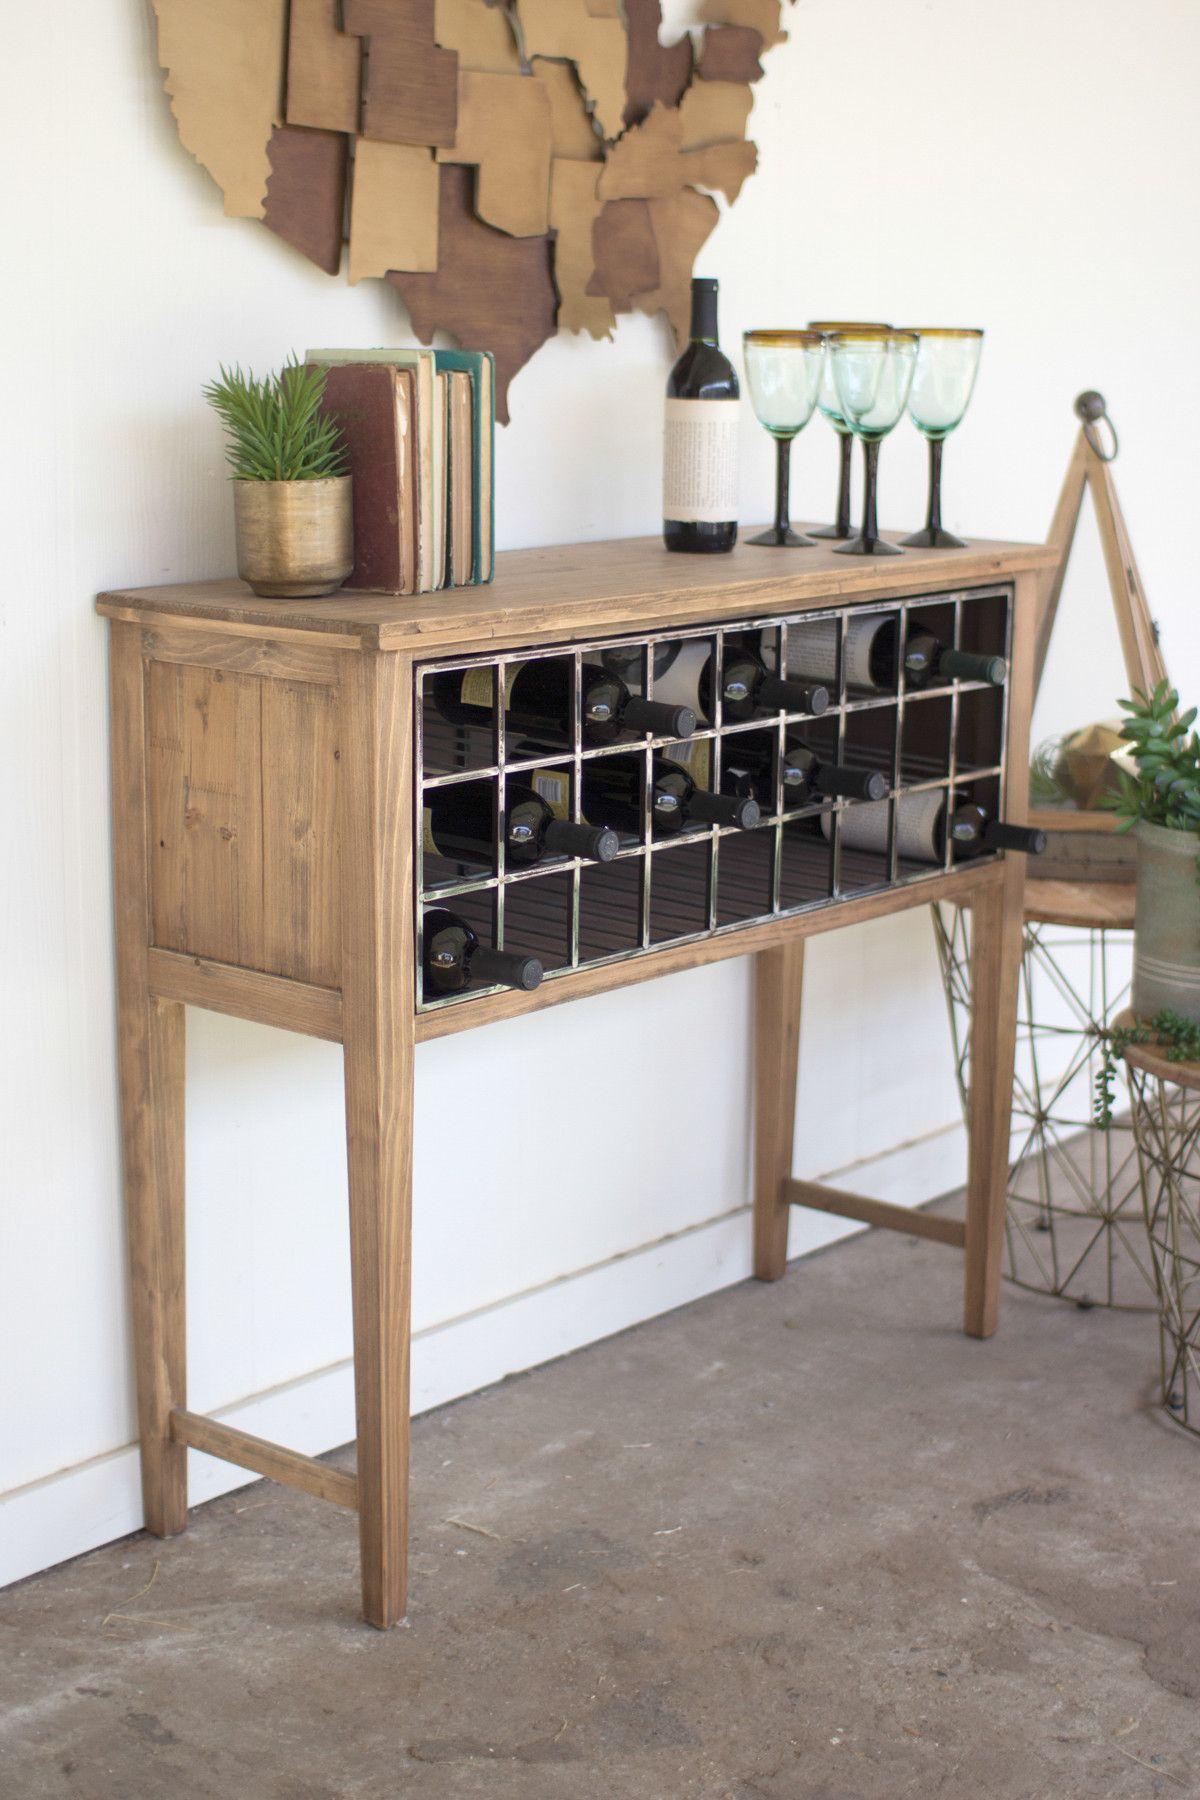 Wood & metal wine rack console